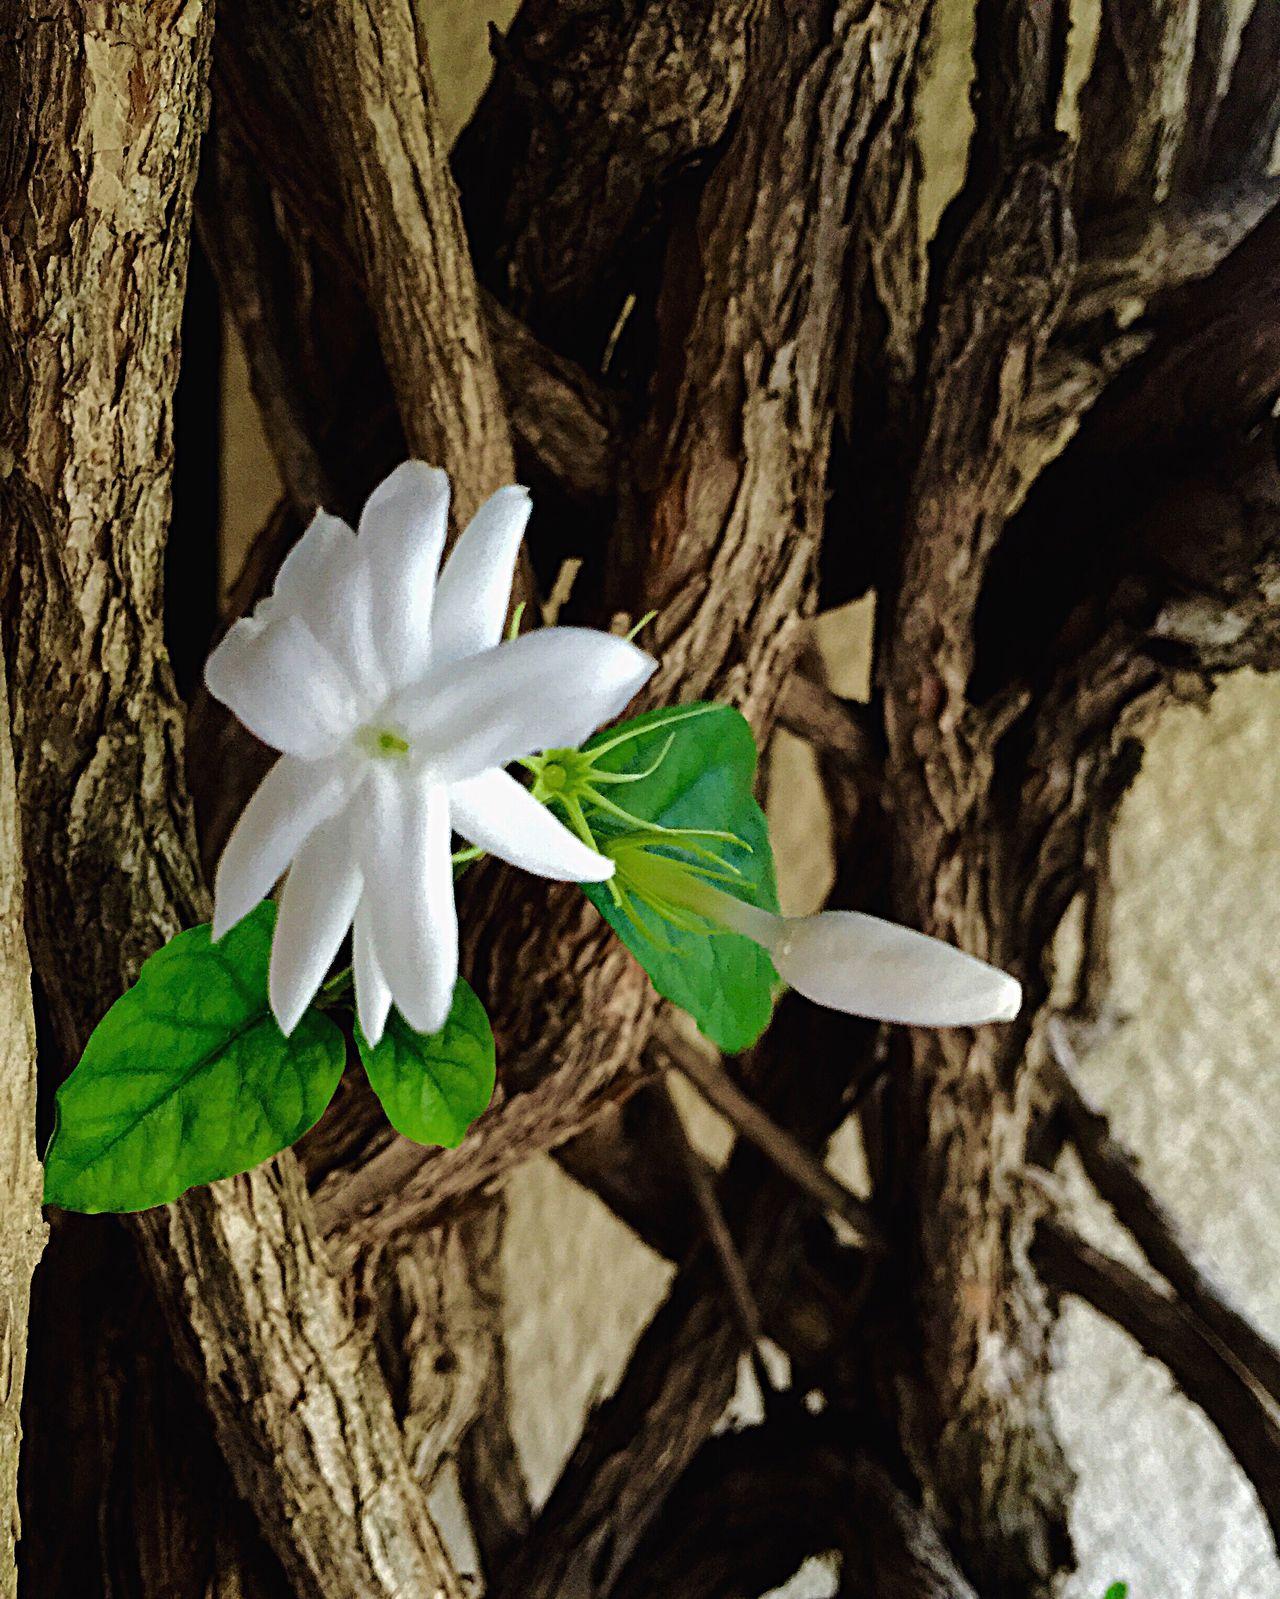 Jasmim Flower Lovely Nature Fragility White Color Close-up Beauty In Nature Petal Favorite Flower